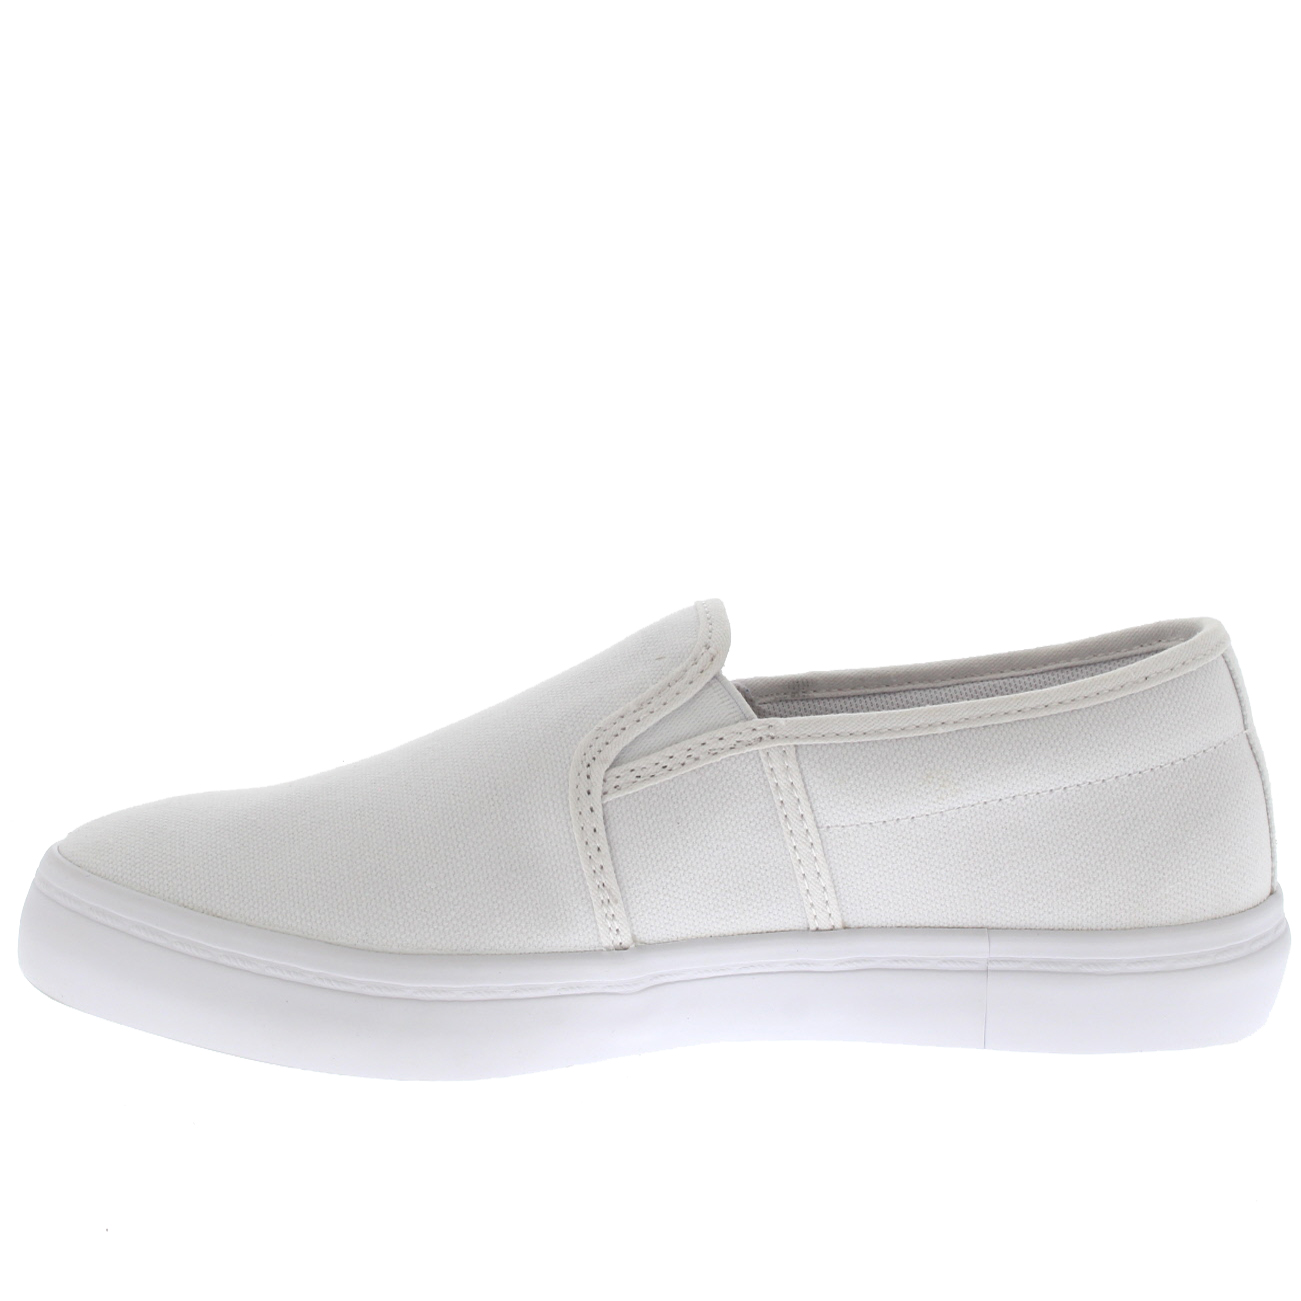 92d2de3b4b2e70 Ladies Lacoste Gazon BL 2 Canvas White Tennis Flat Fashion Trainers All  Sizes